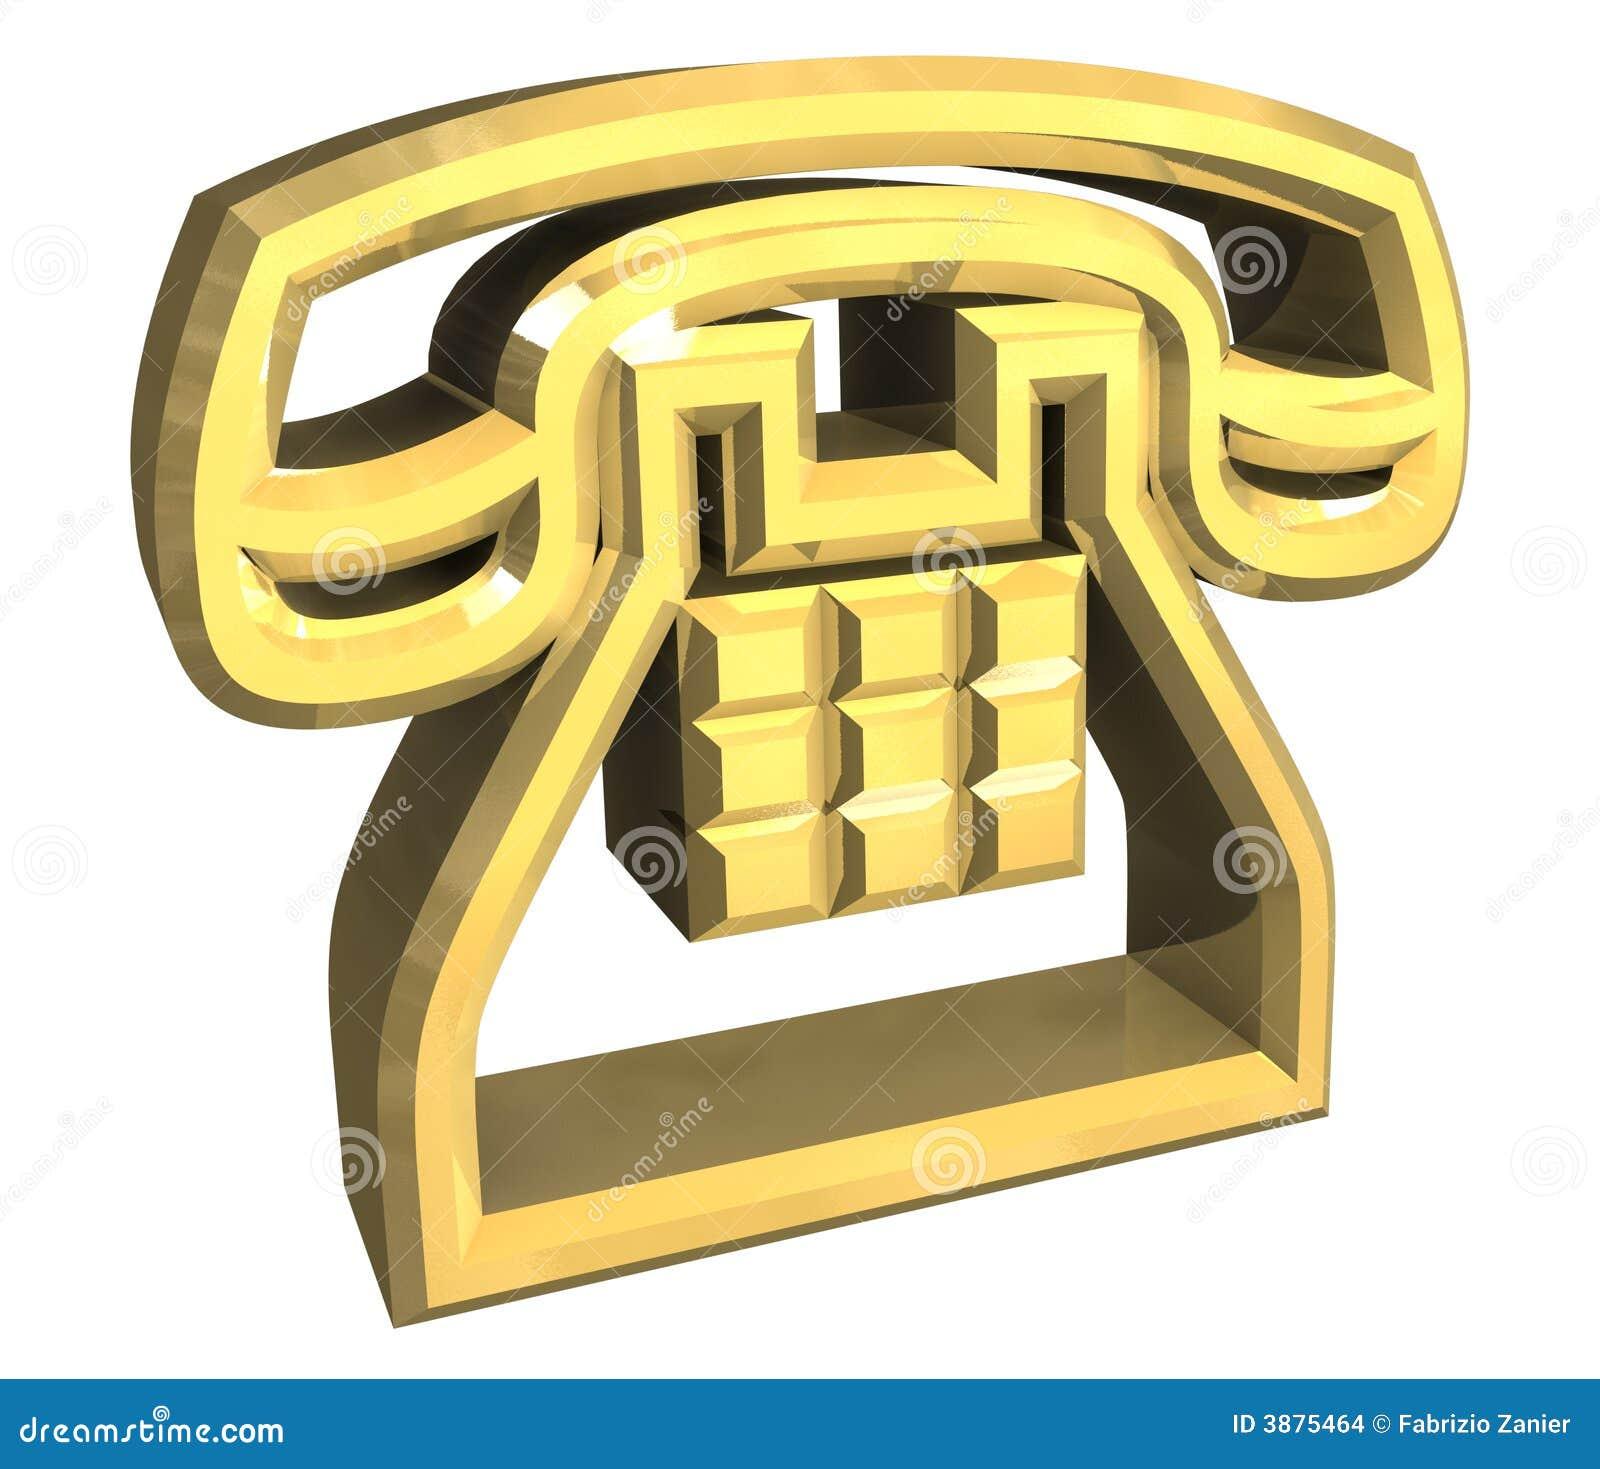 Phone Symbol In Gold 3d Stock Illustration Illustration Of